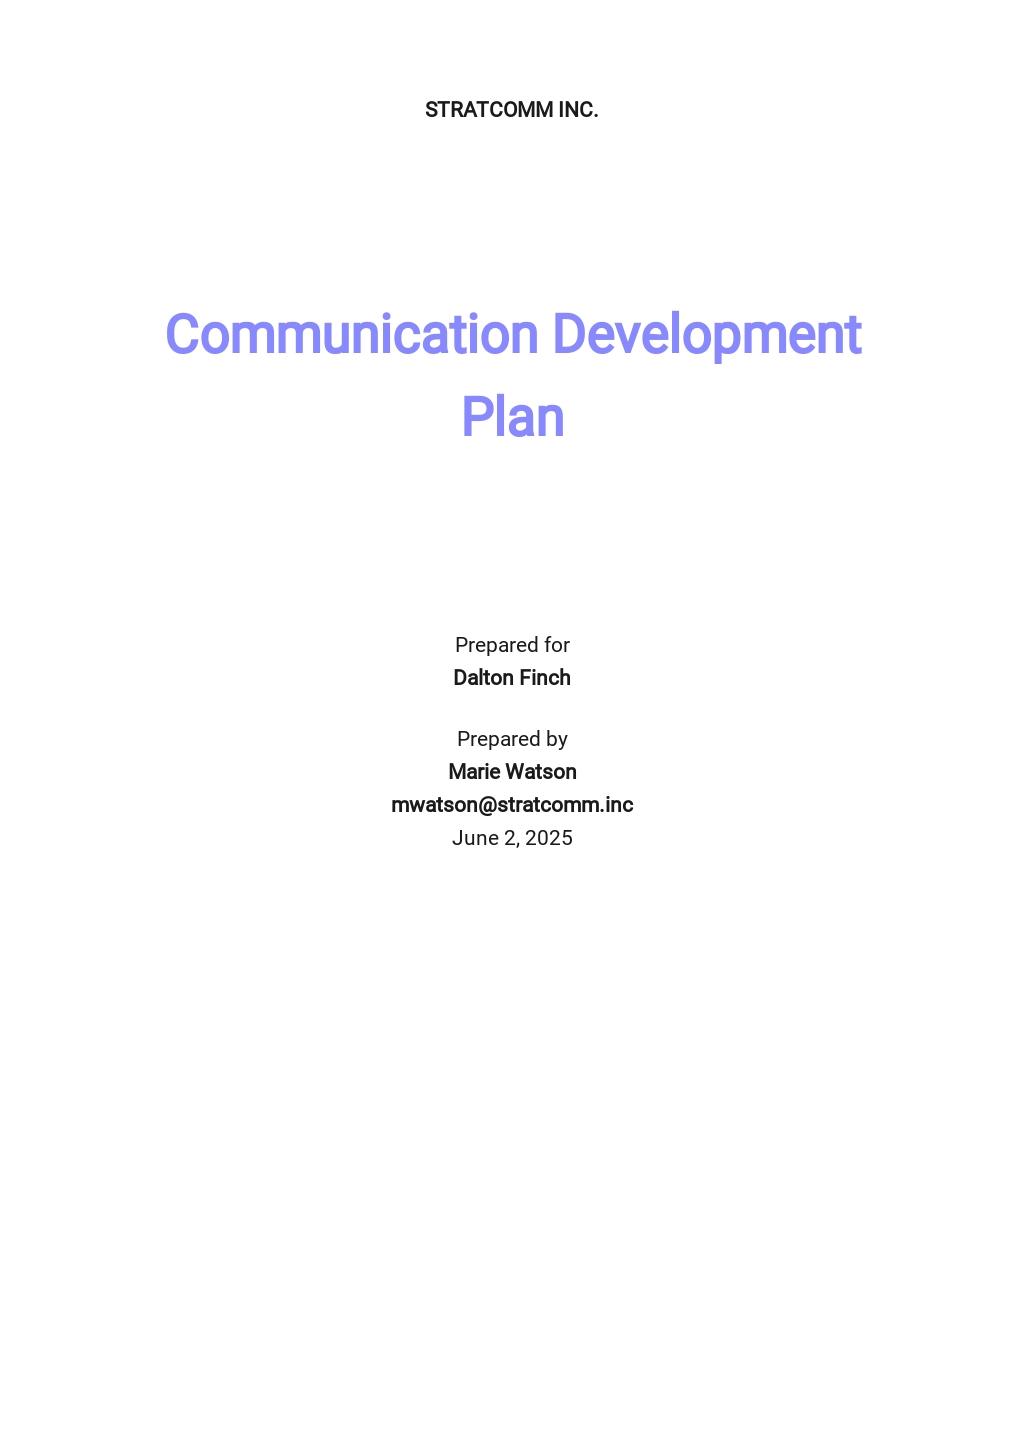 Communication Development Plan Template.jpe